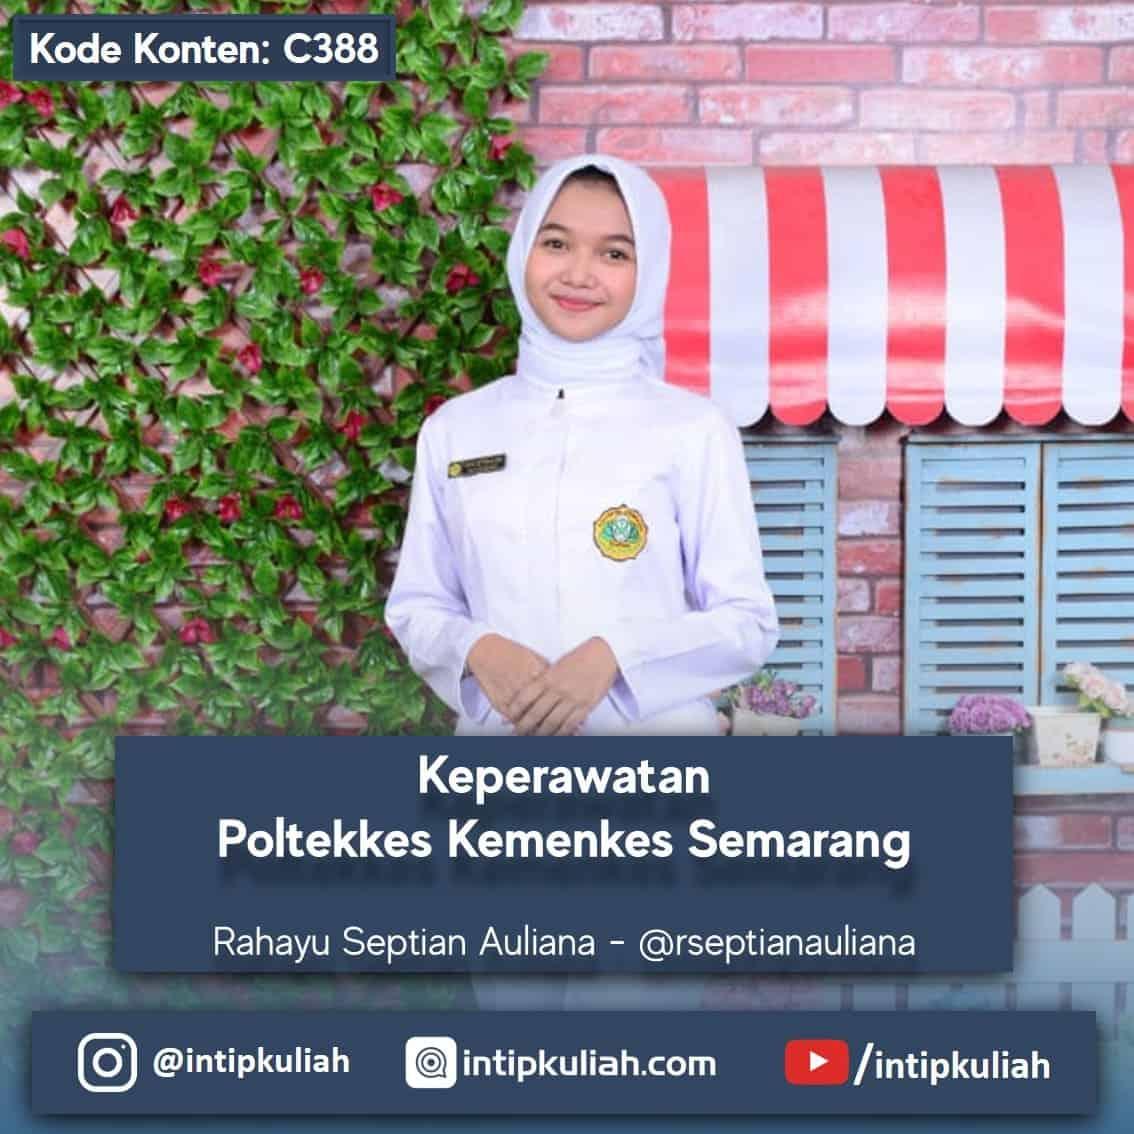 Keperawatan Poltekkes Kemenkes Semarang (Rahayu)